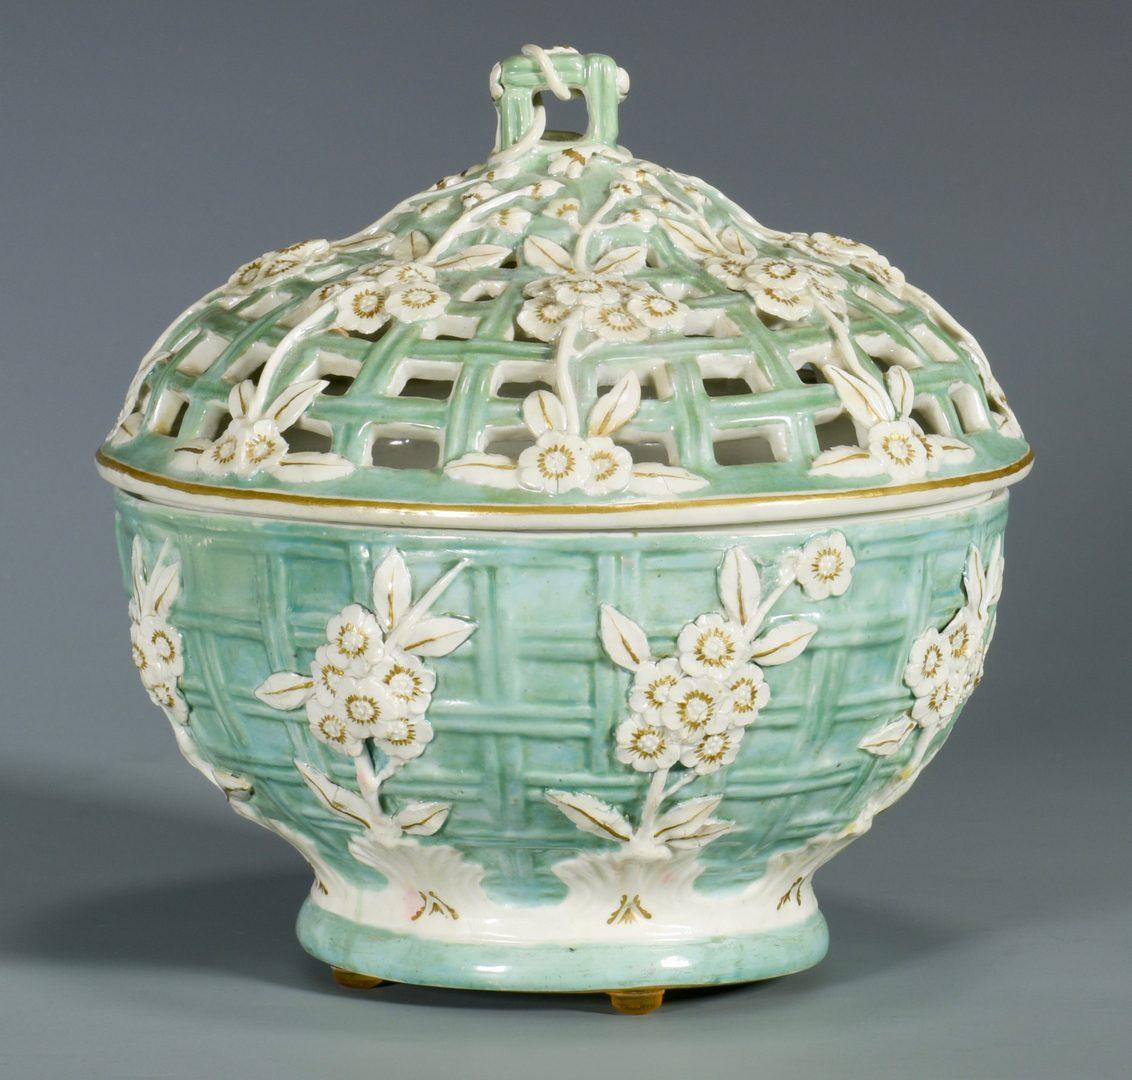 Lot 77: English Porcelain Chestnut Bowl